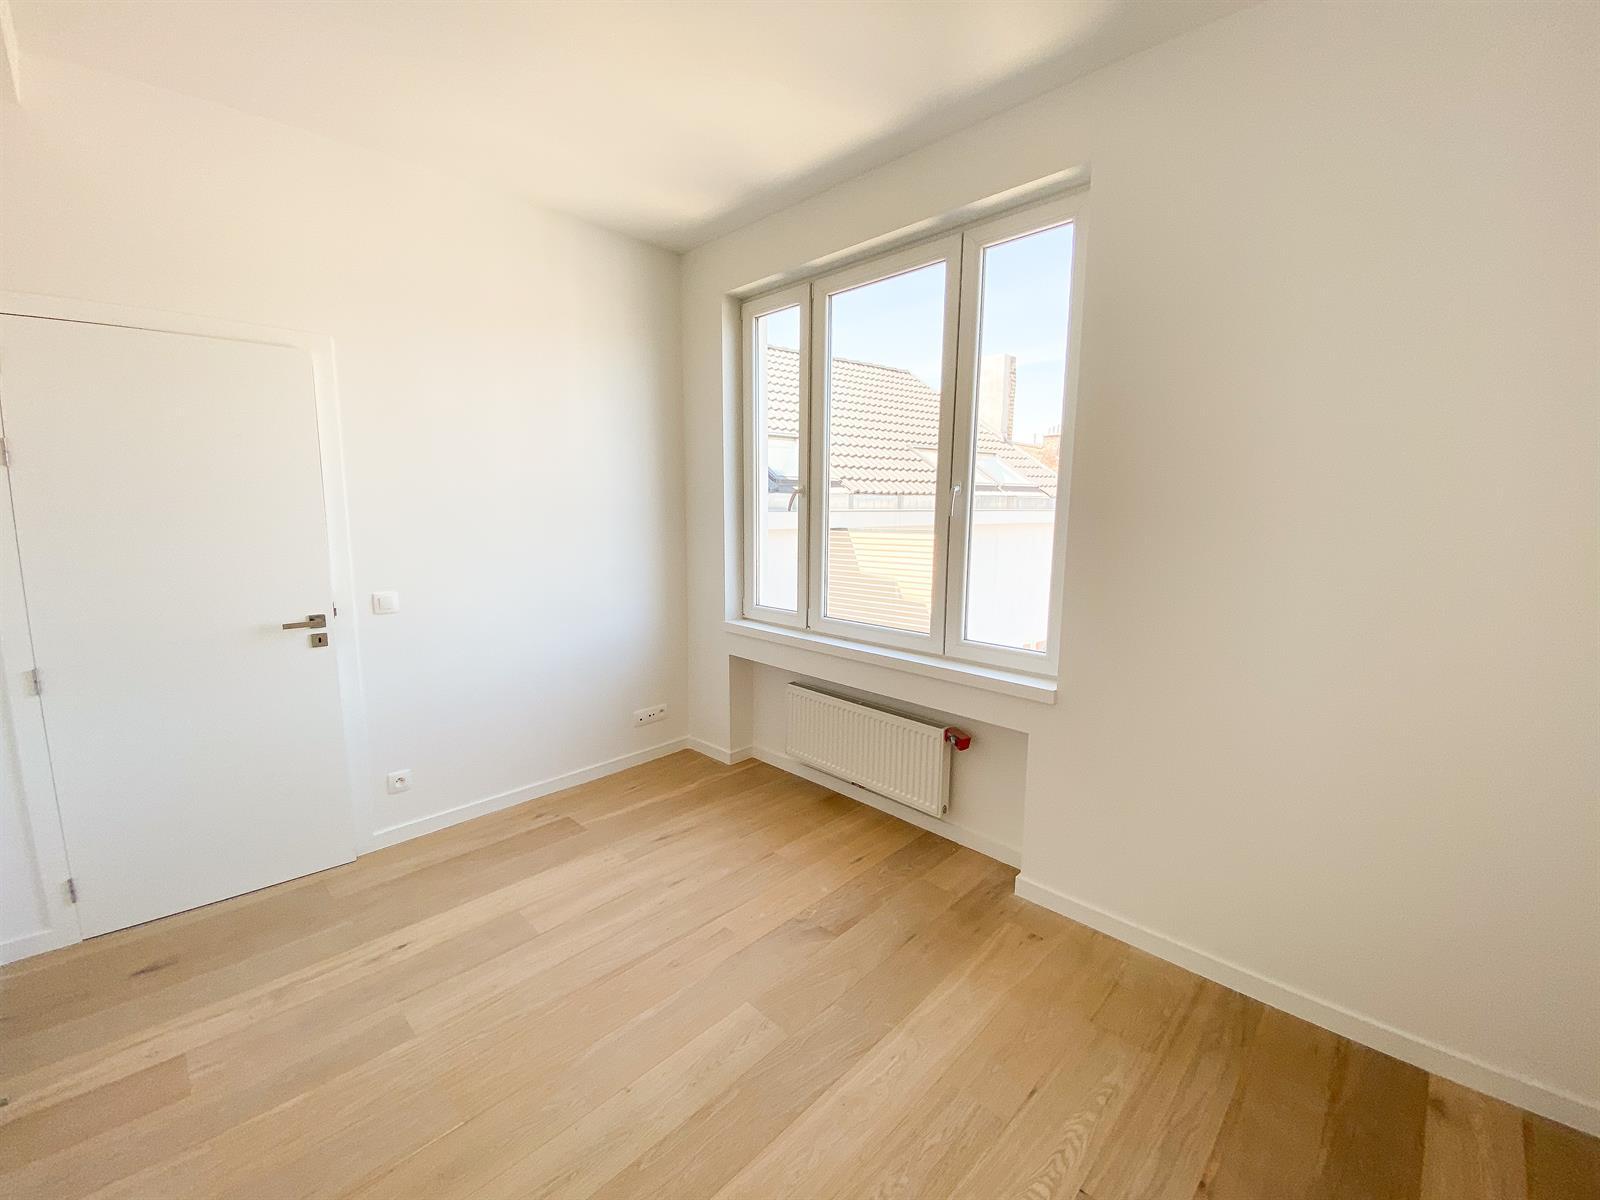 Appartement - Liège - #4045845-11